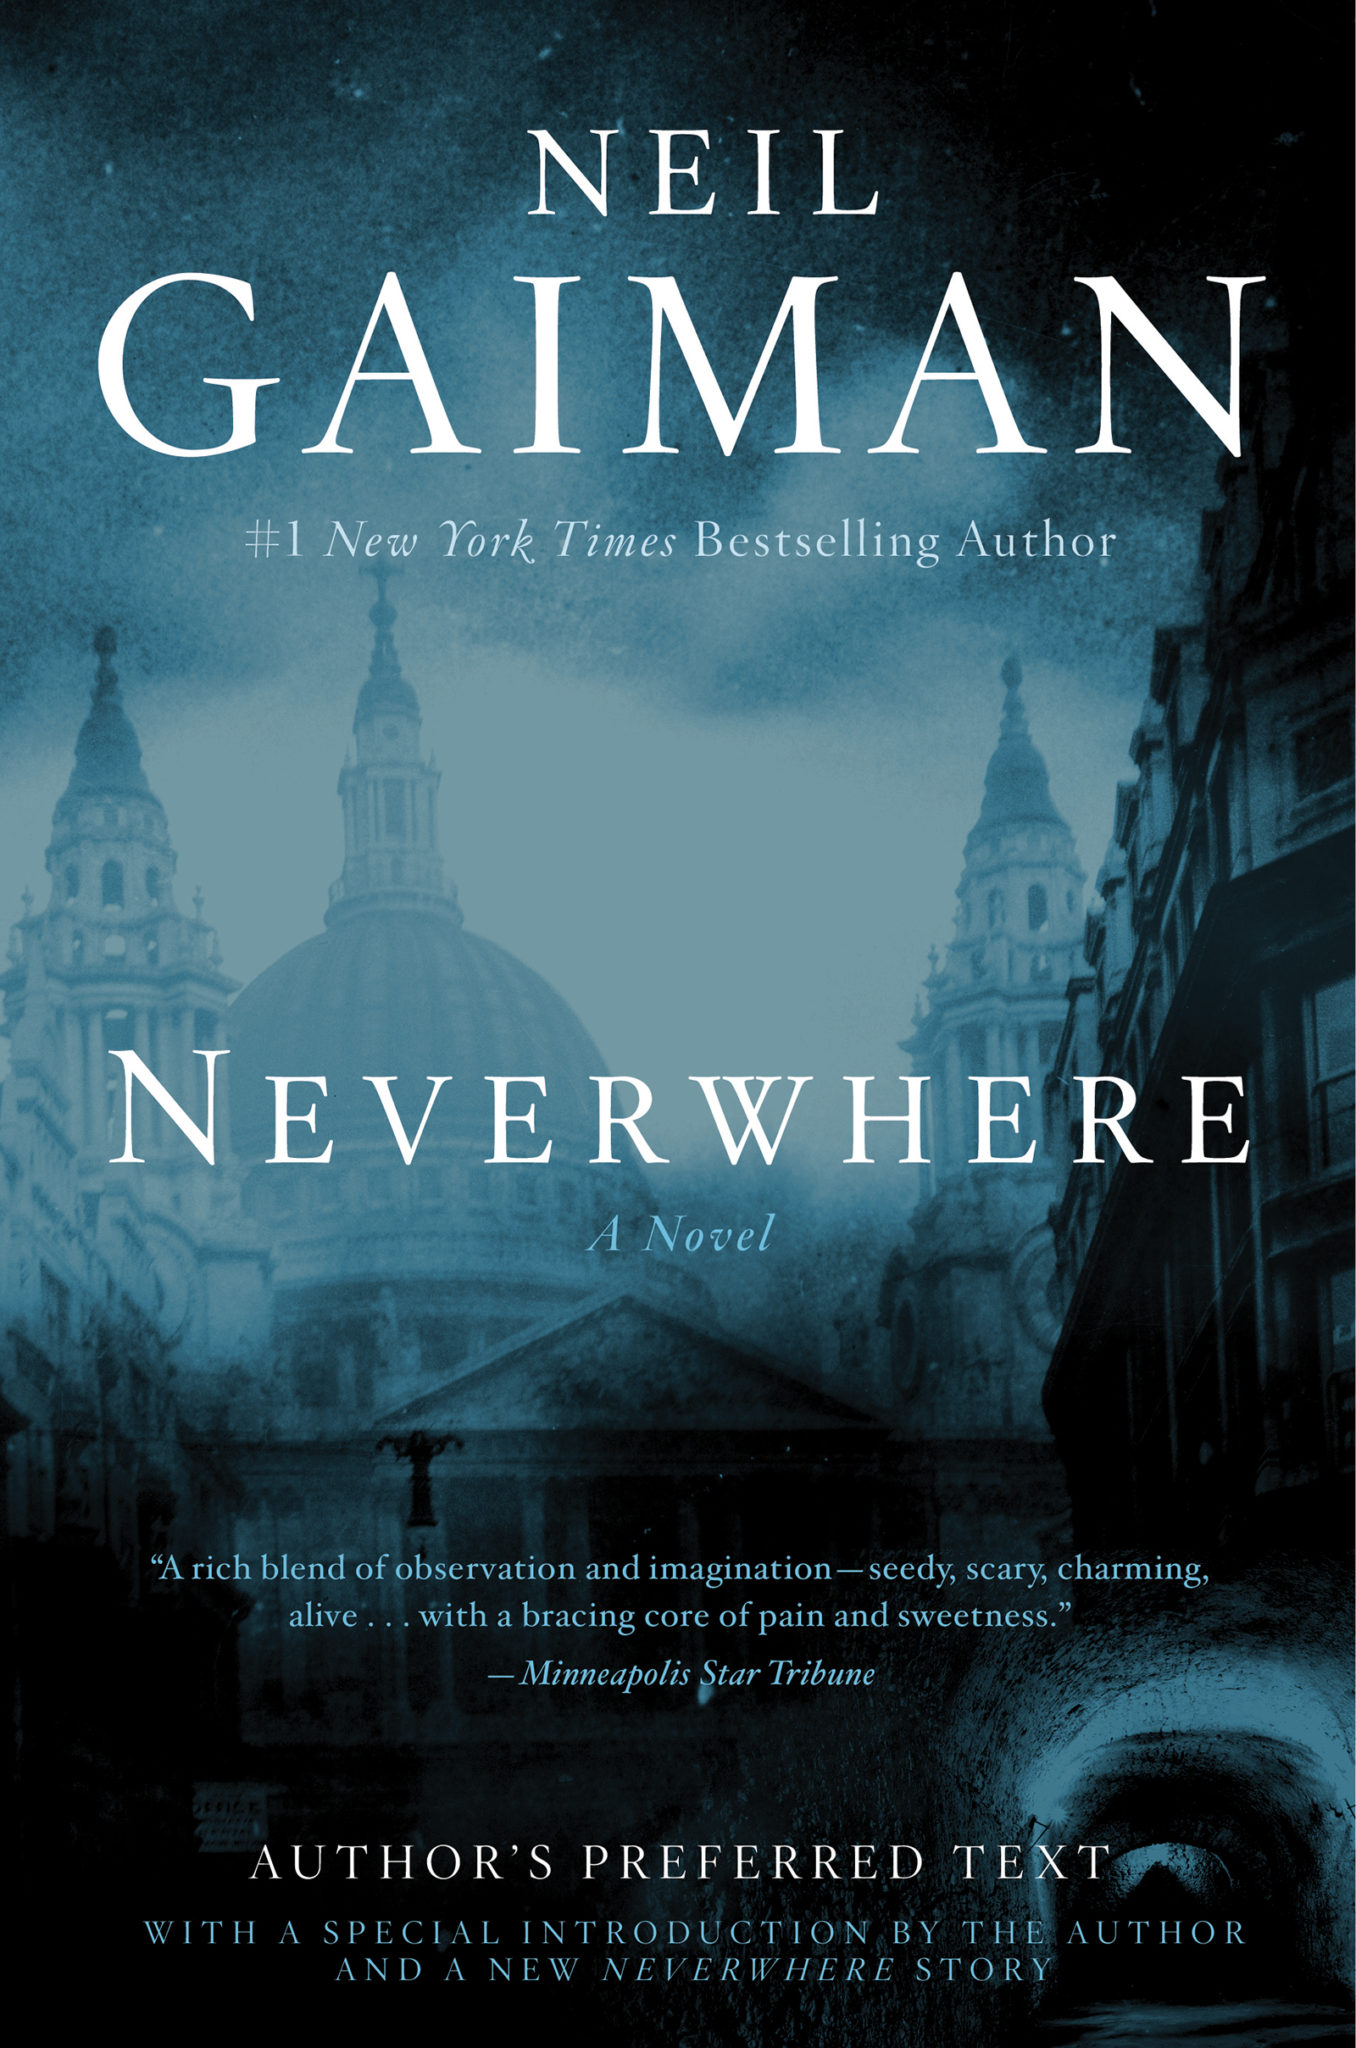 Neil Gaiman books 22